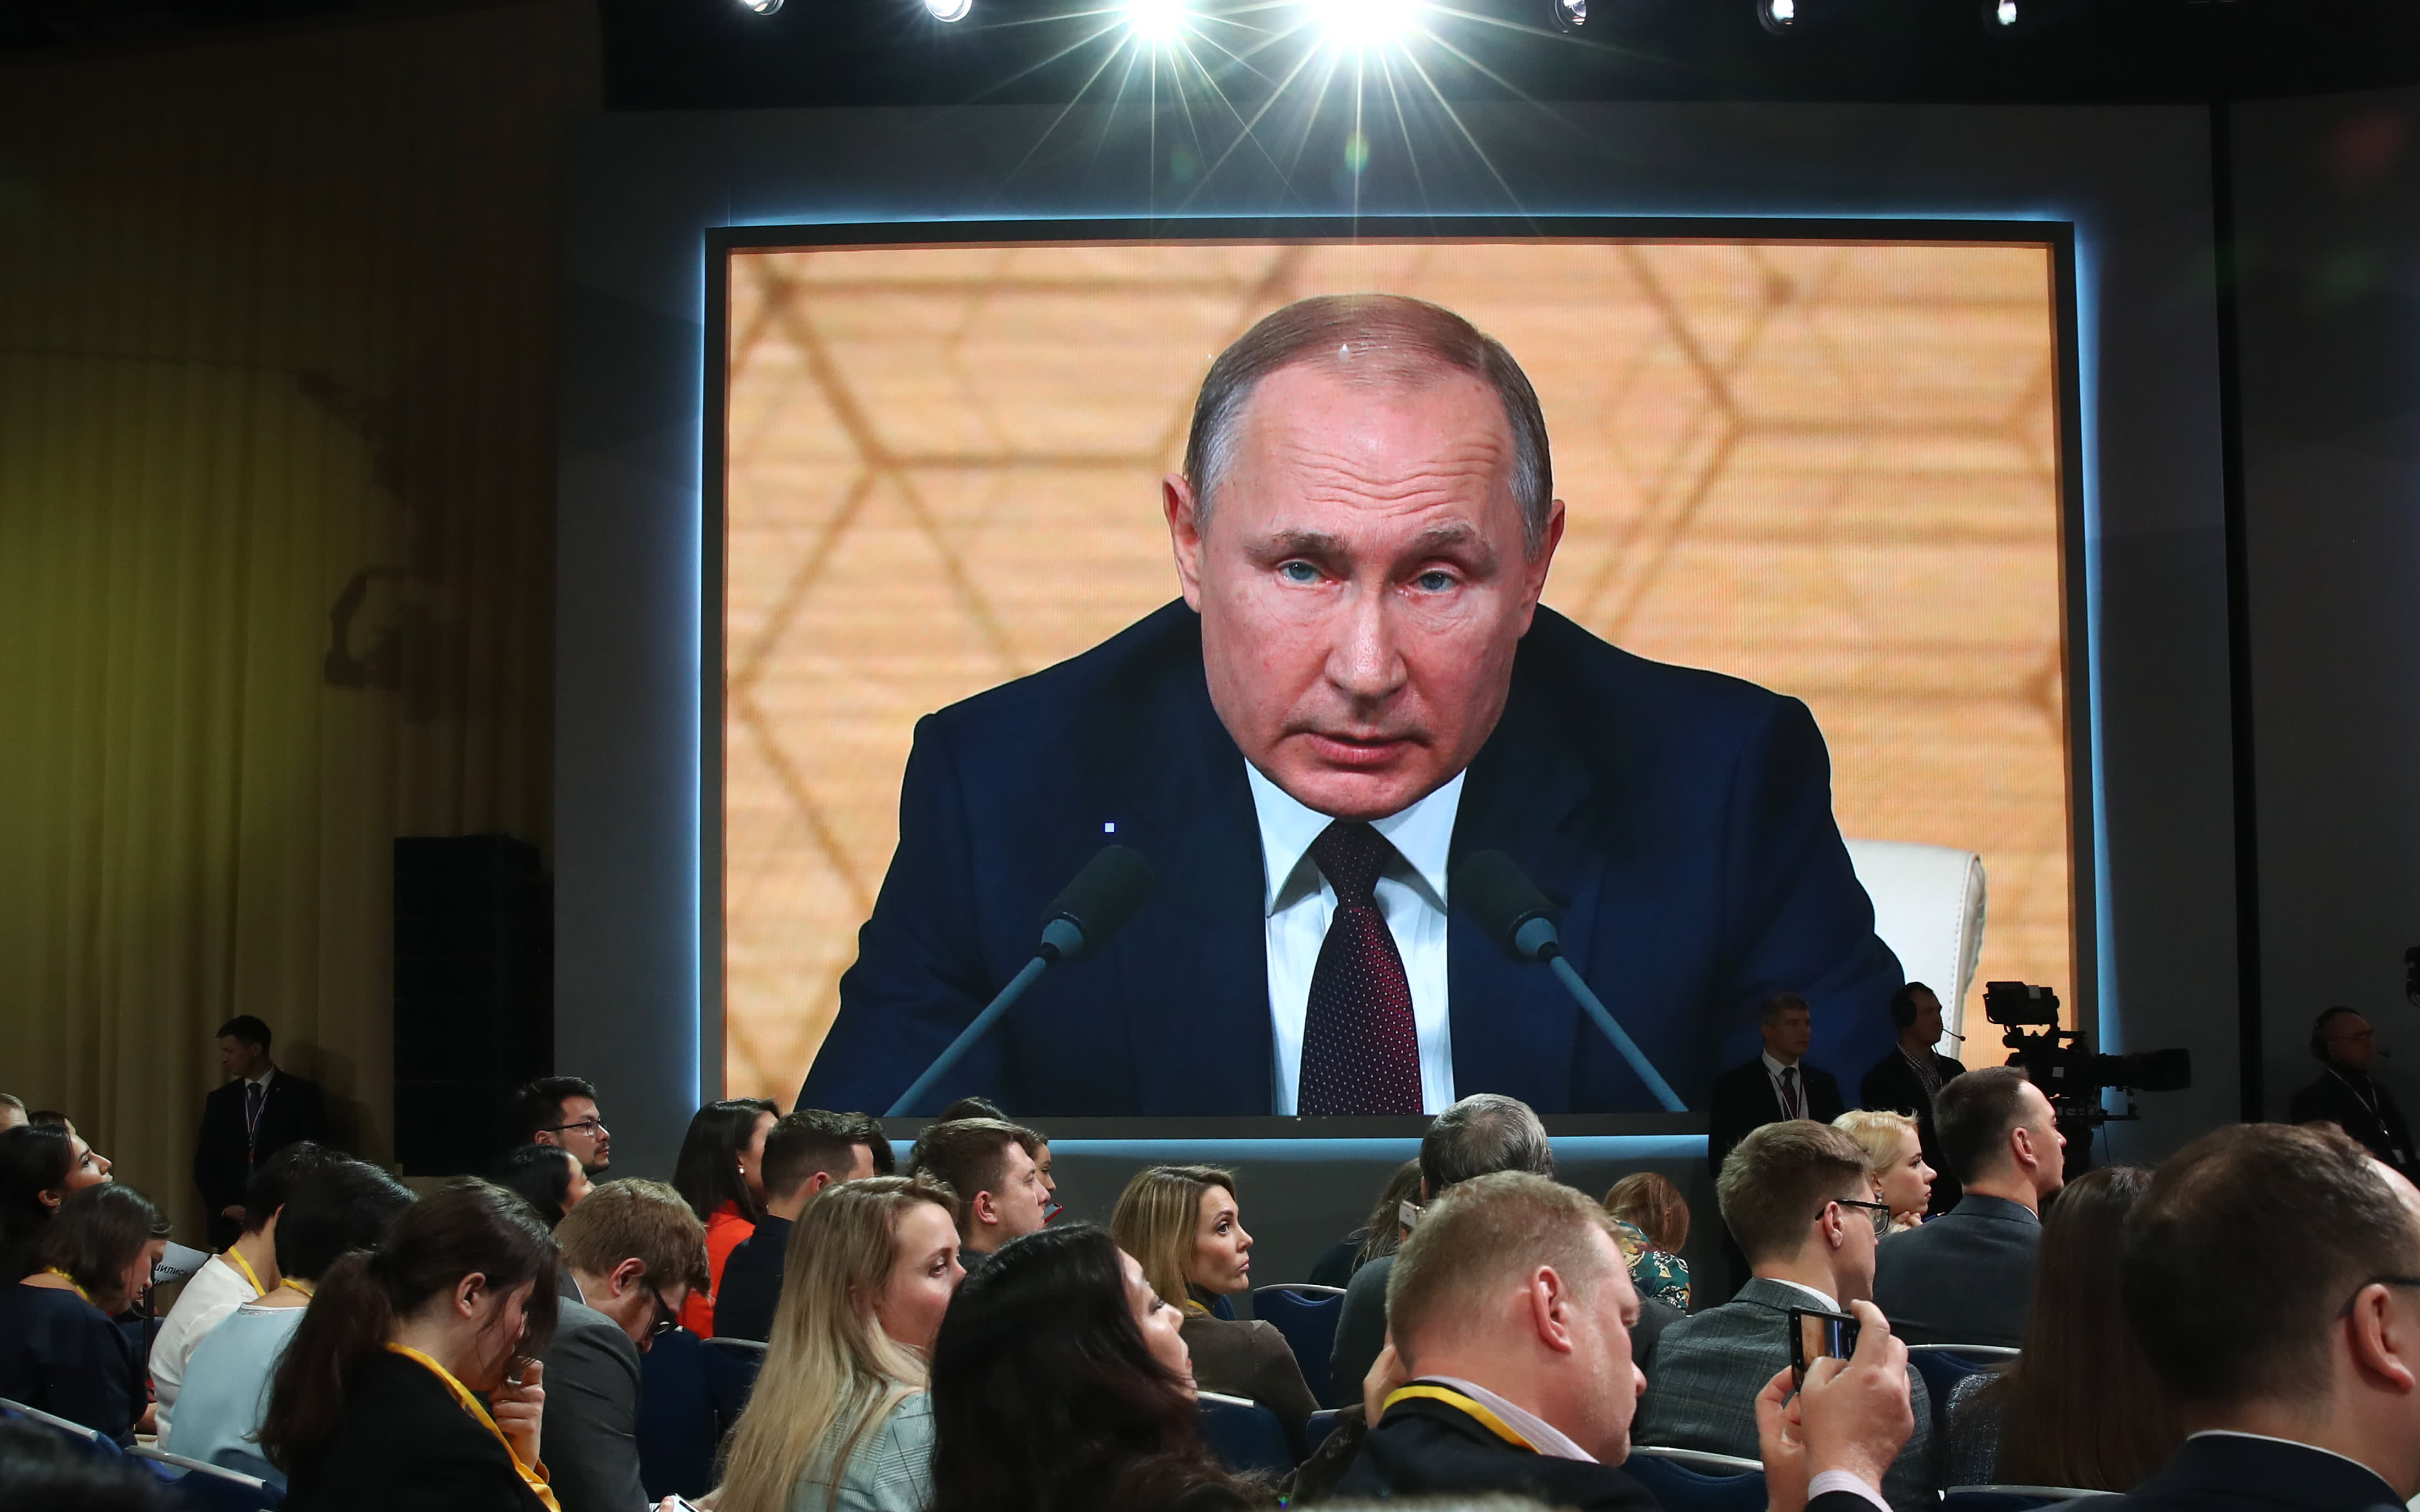 Coronavirus Russia Putin S Popularity Rating Falls To Historic Low